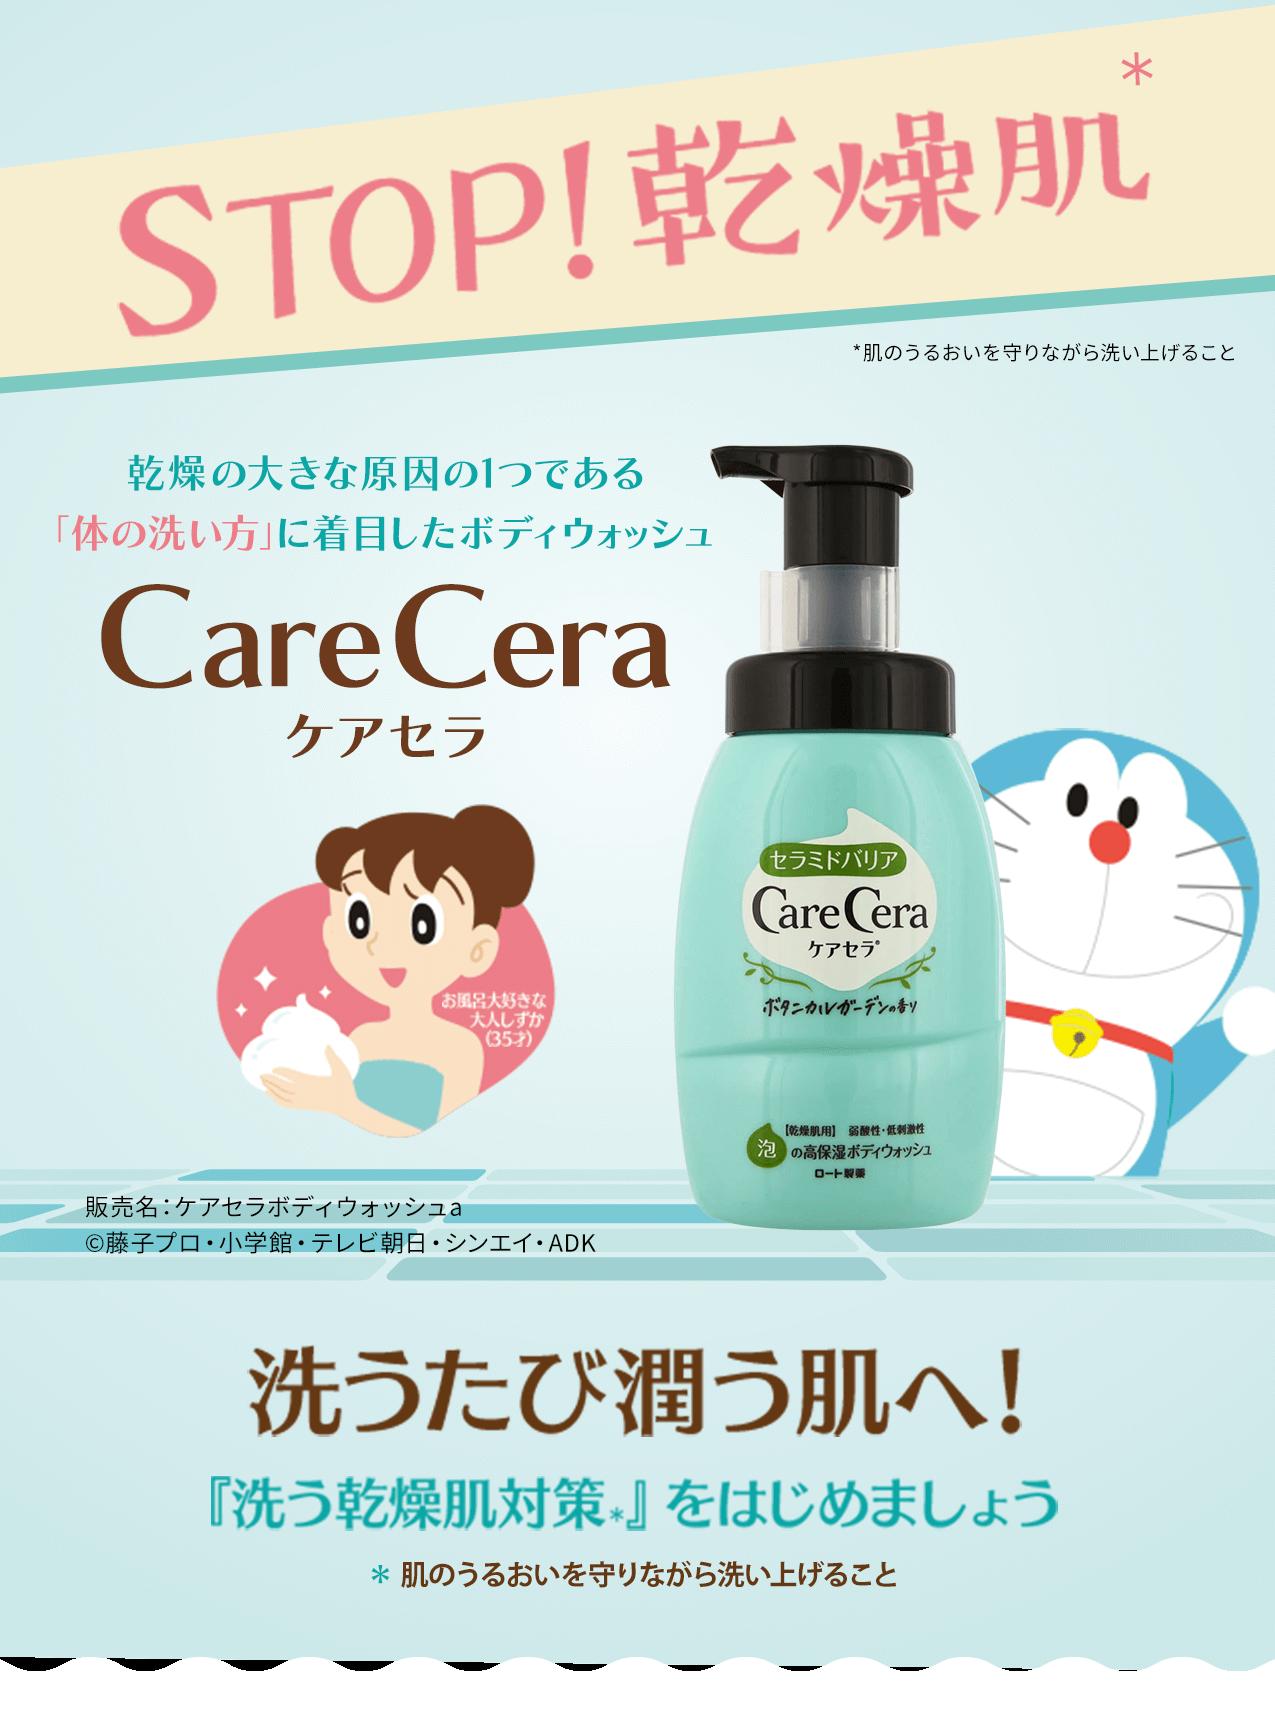 STOP!乾燥肌 乾燥の大きな原因の1つである         「体の洗い方」に着目したボディウォッシュ CareCera